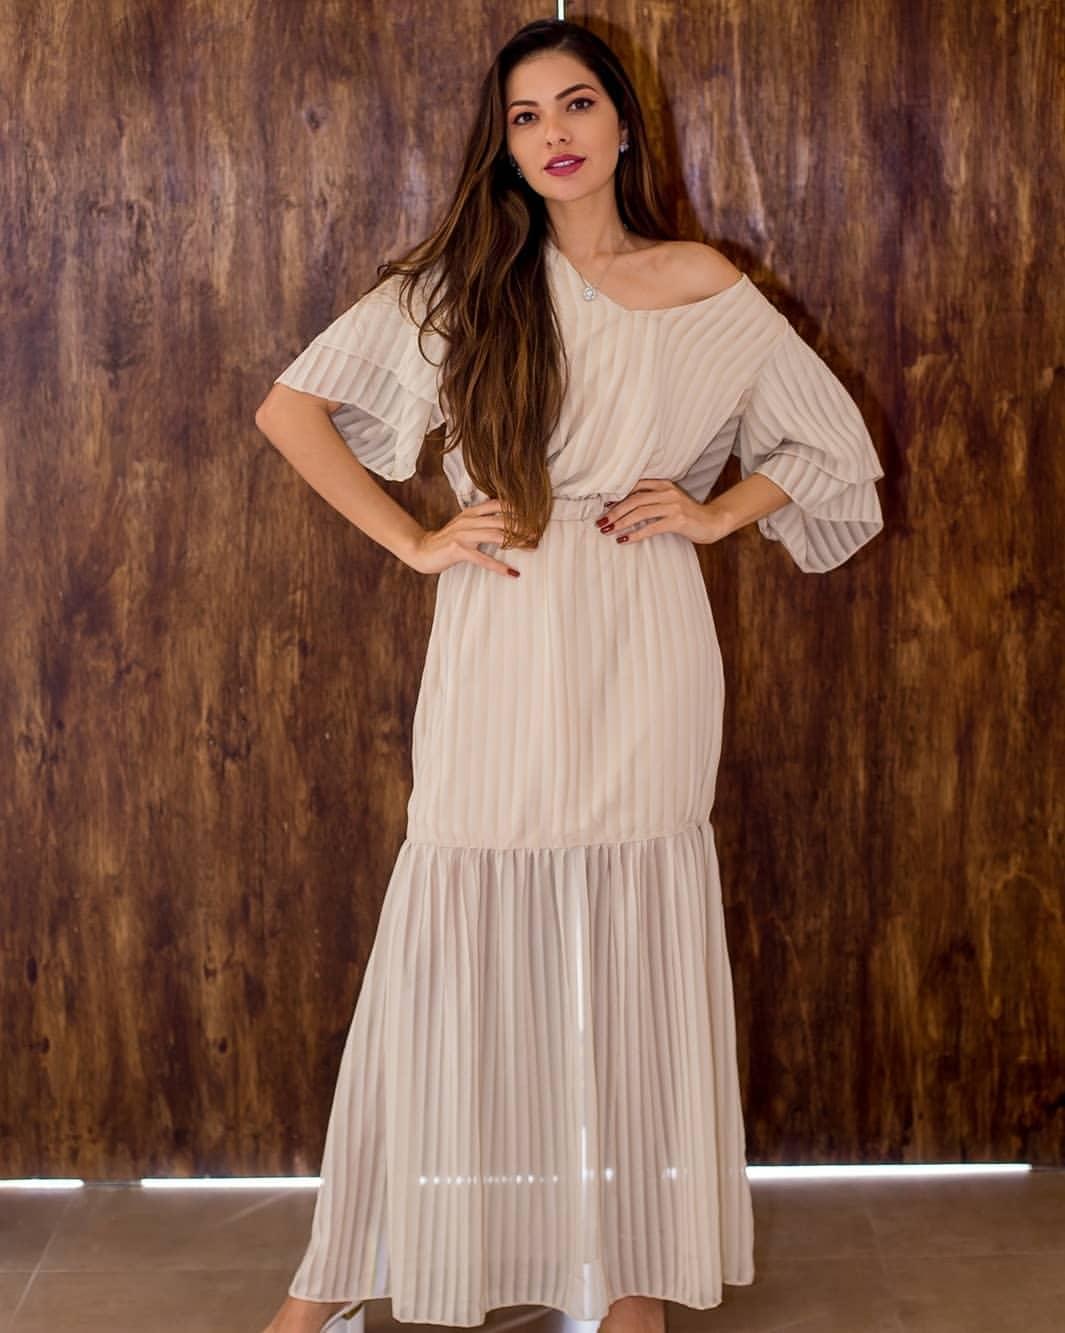 fabricia belford, top 10 de miss brasil mundo 2019. 13081152